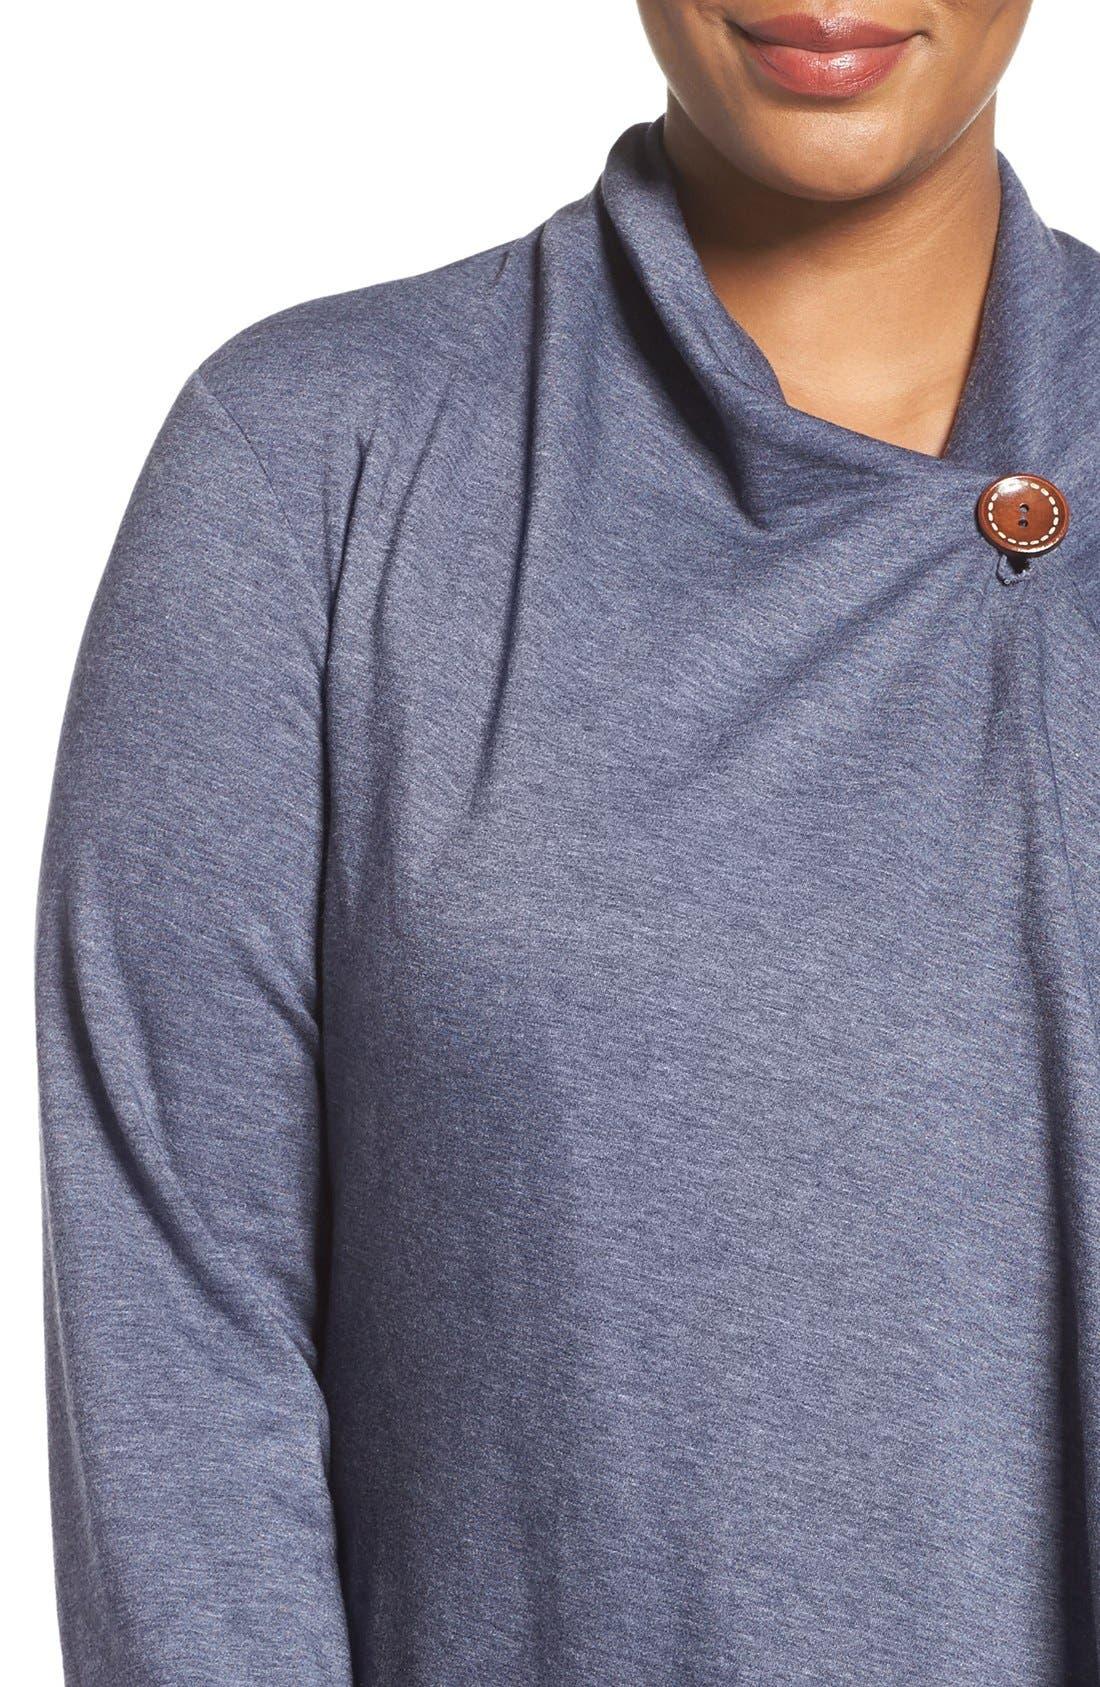 One-Button Fleece Cardigan,                             Alternate thumbnail 152, color,